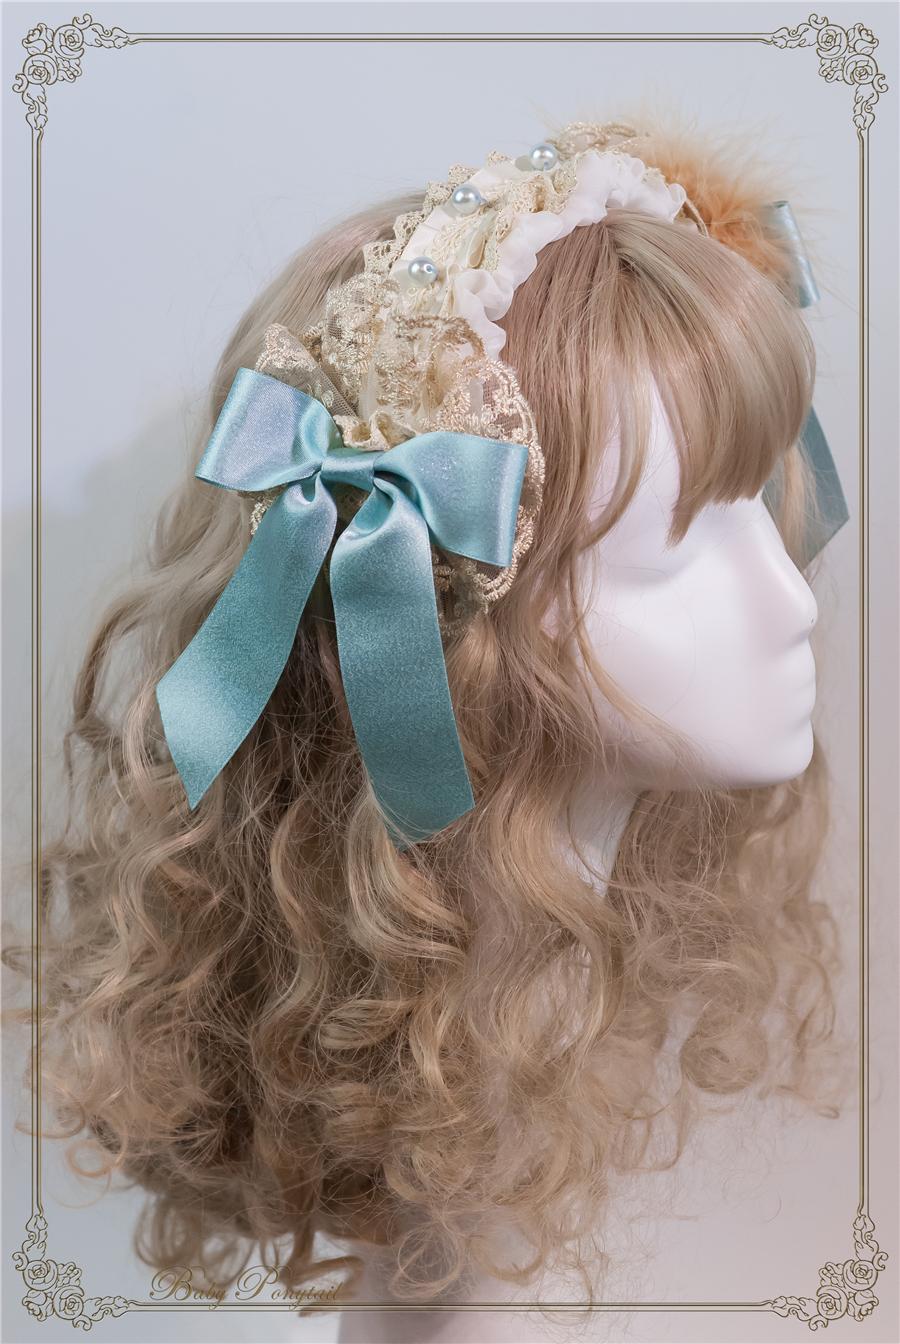 Baby Ponytail_Stock photo_Circus Princess_Rose Head Dress Sax_05.jpg